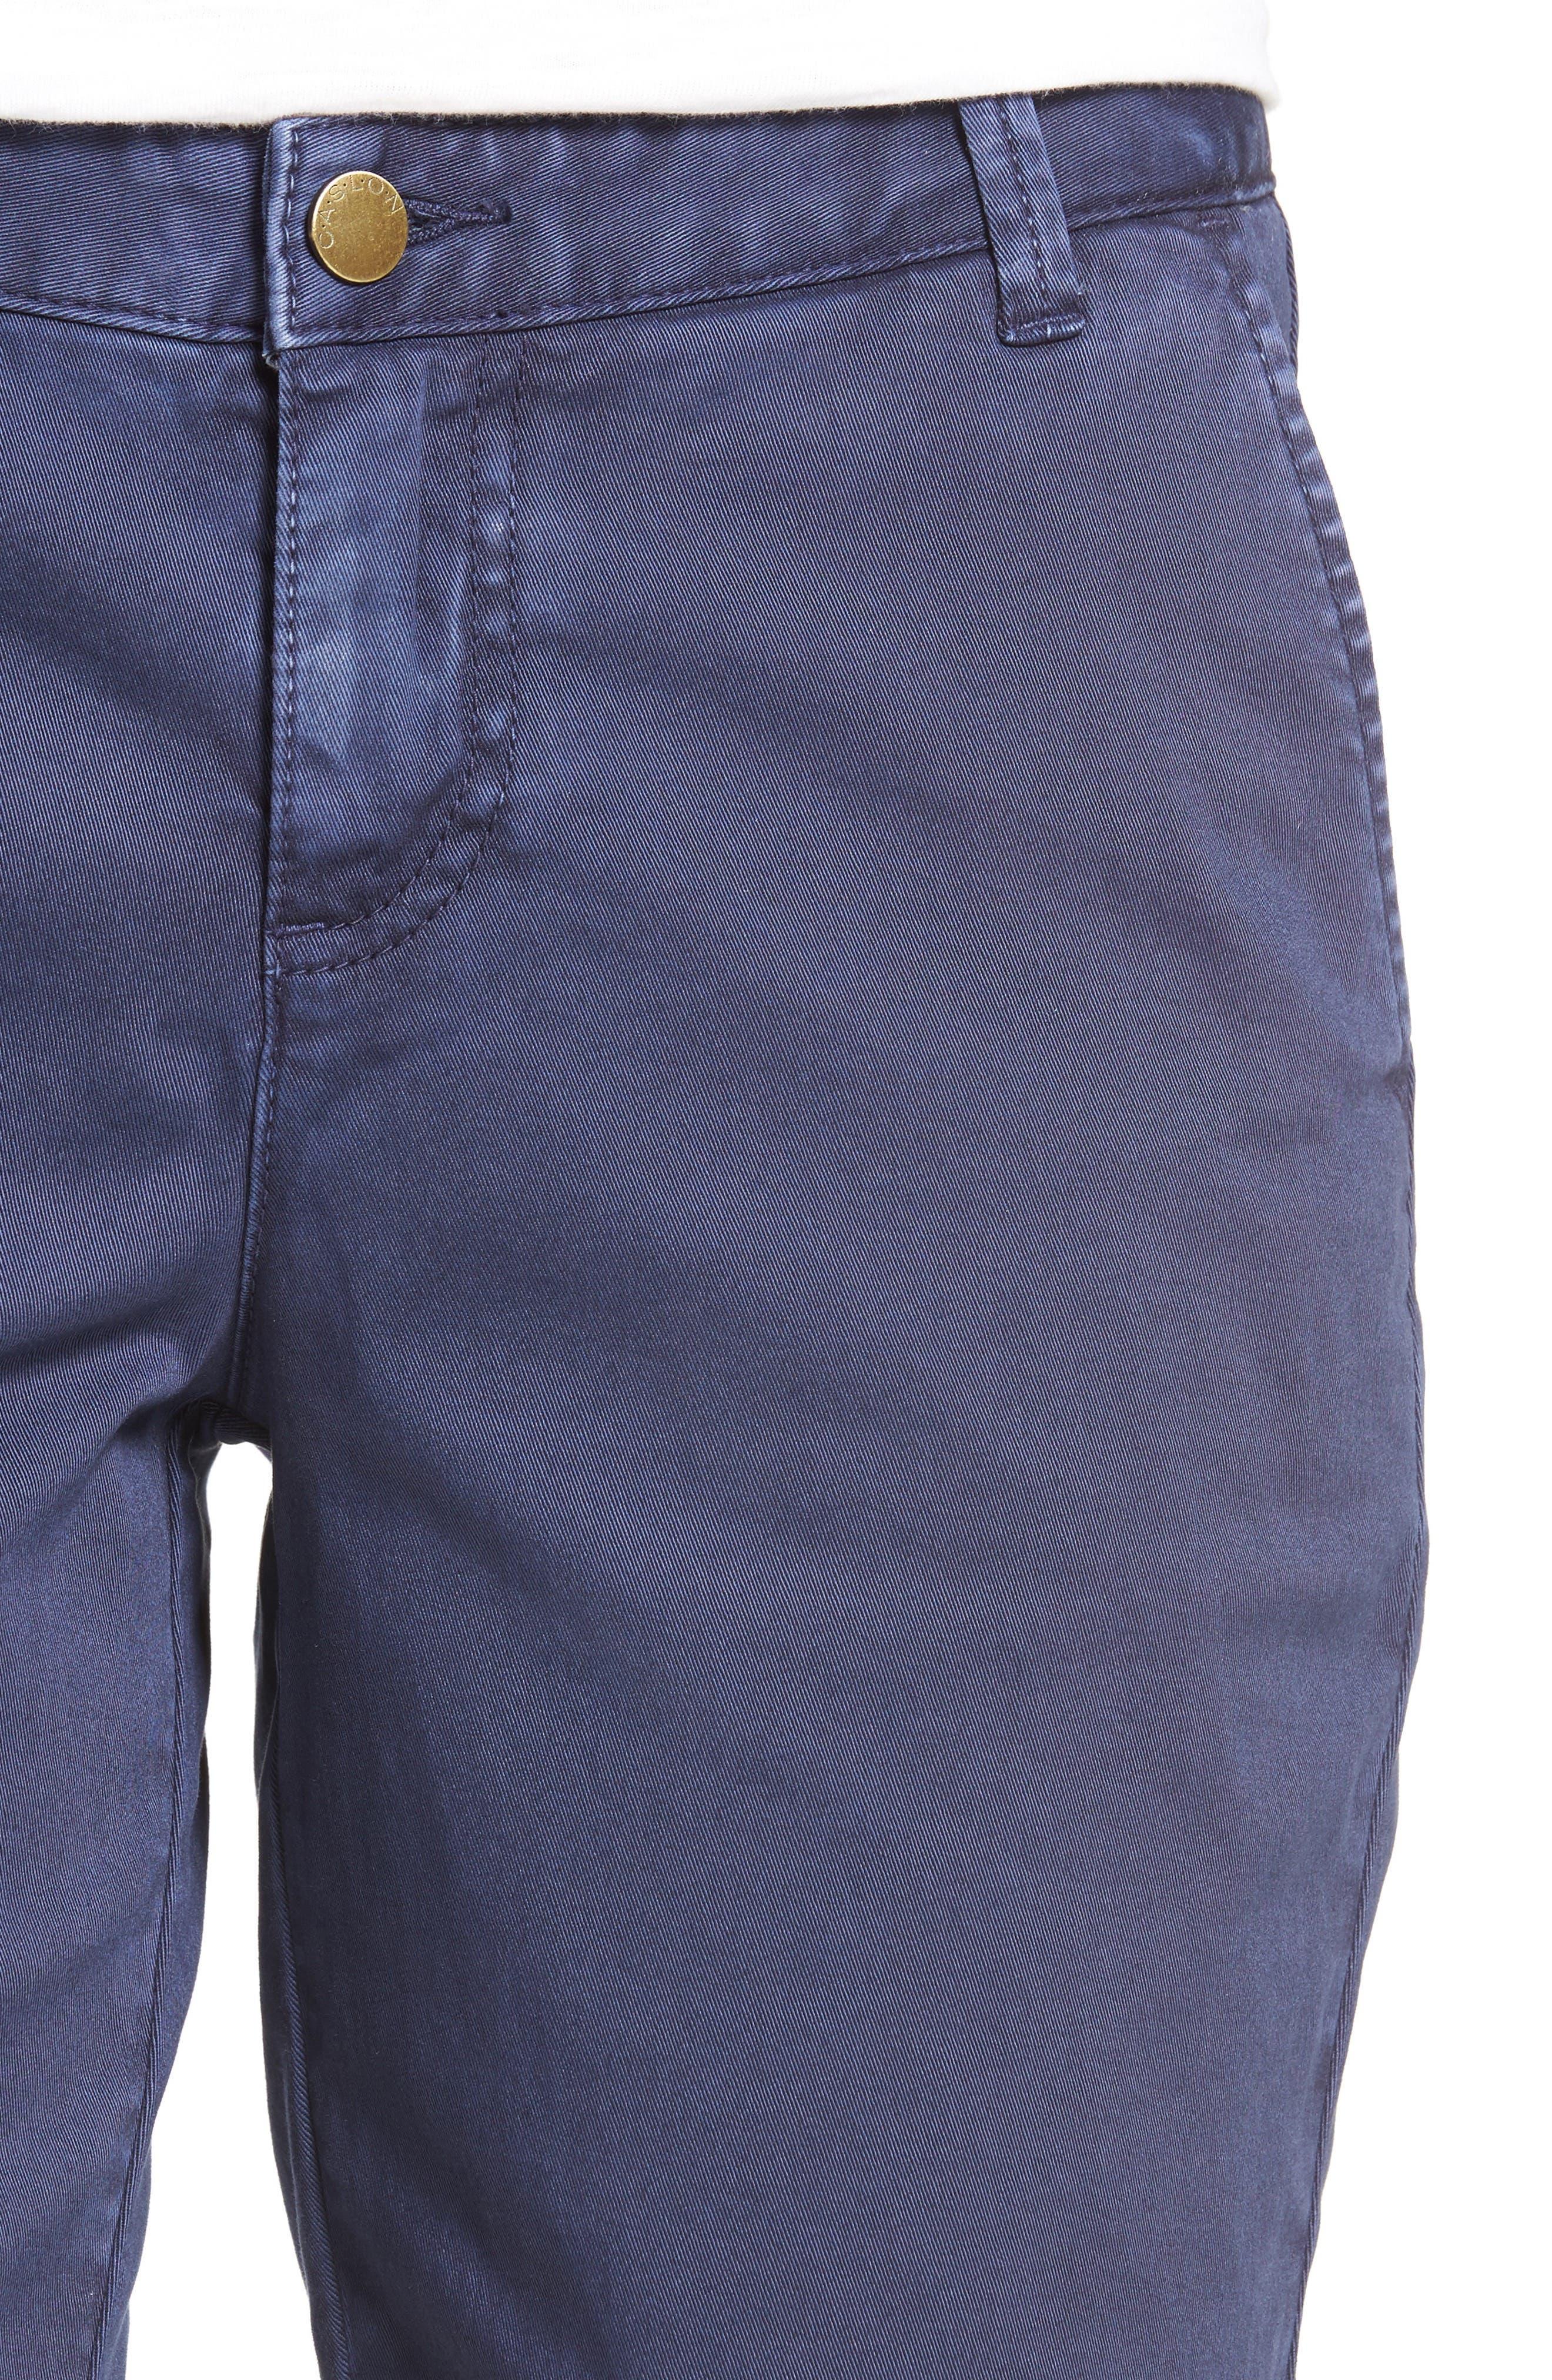 Twill Shorts,                             Alternate thumbnail 32, color,